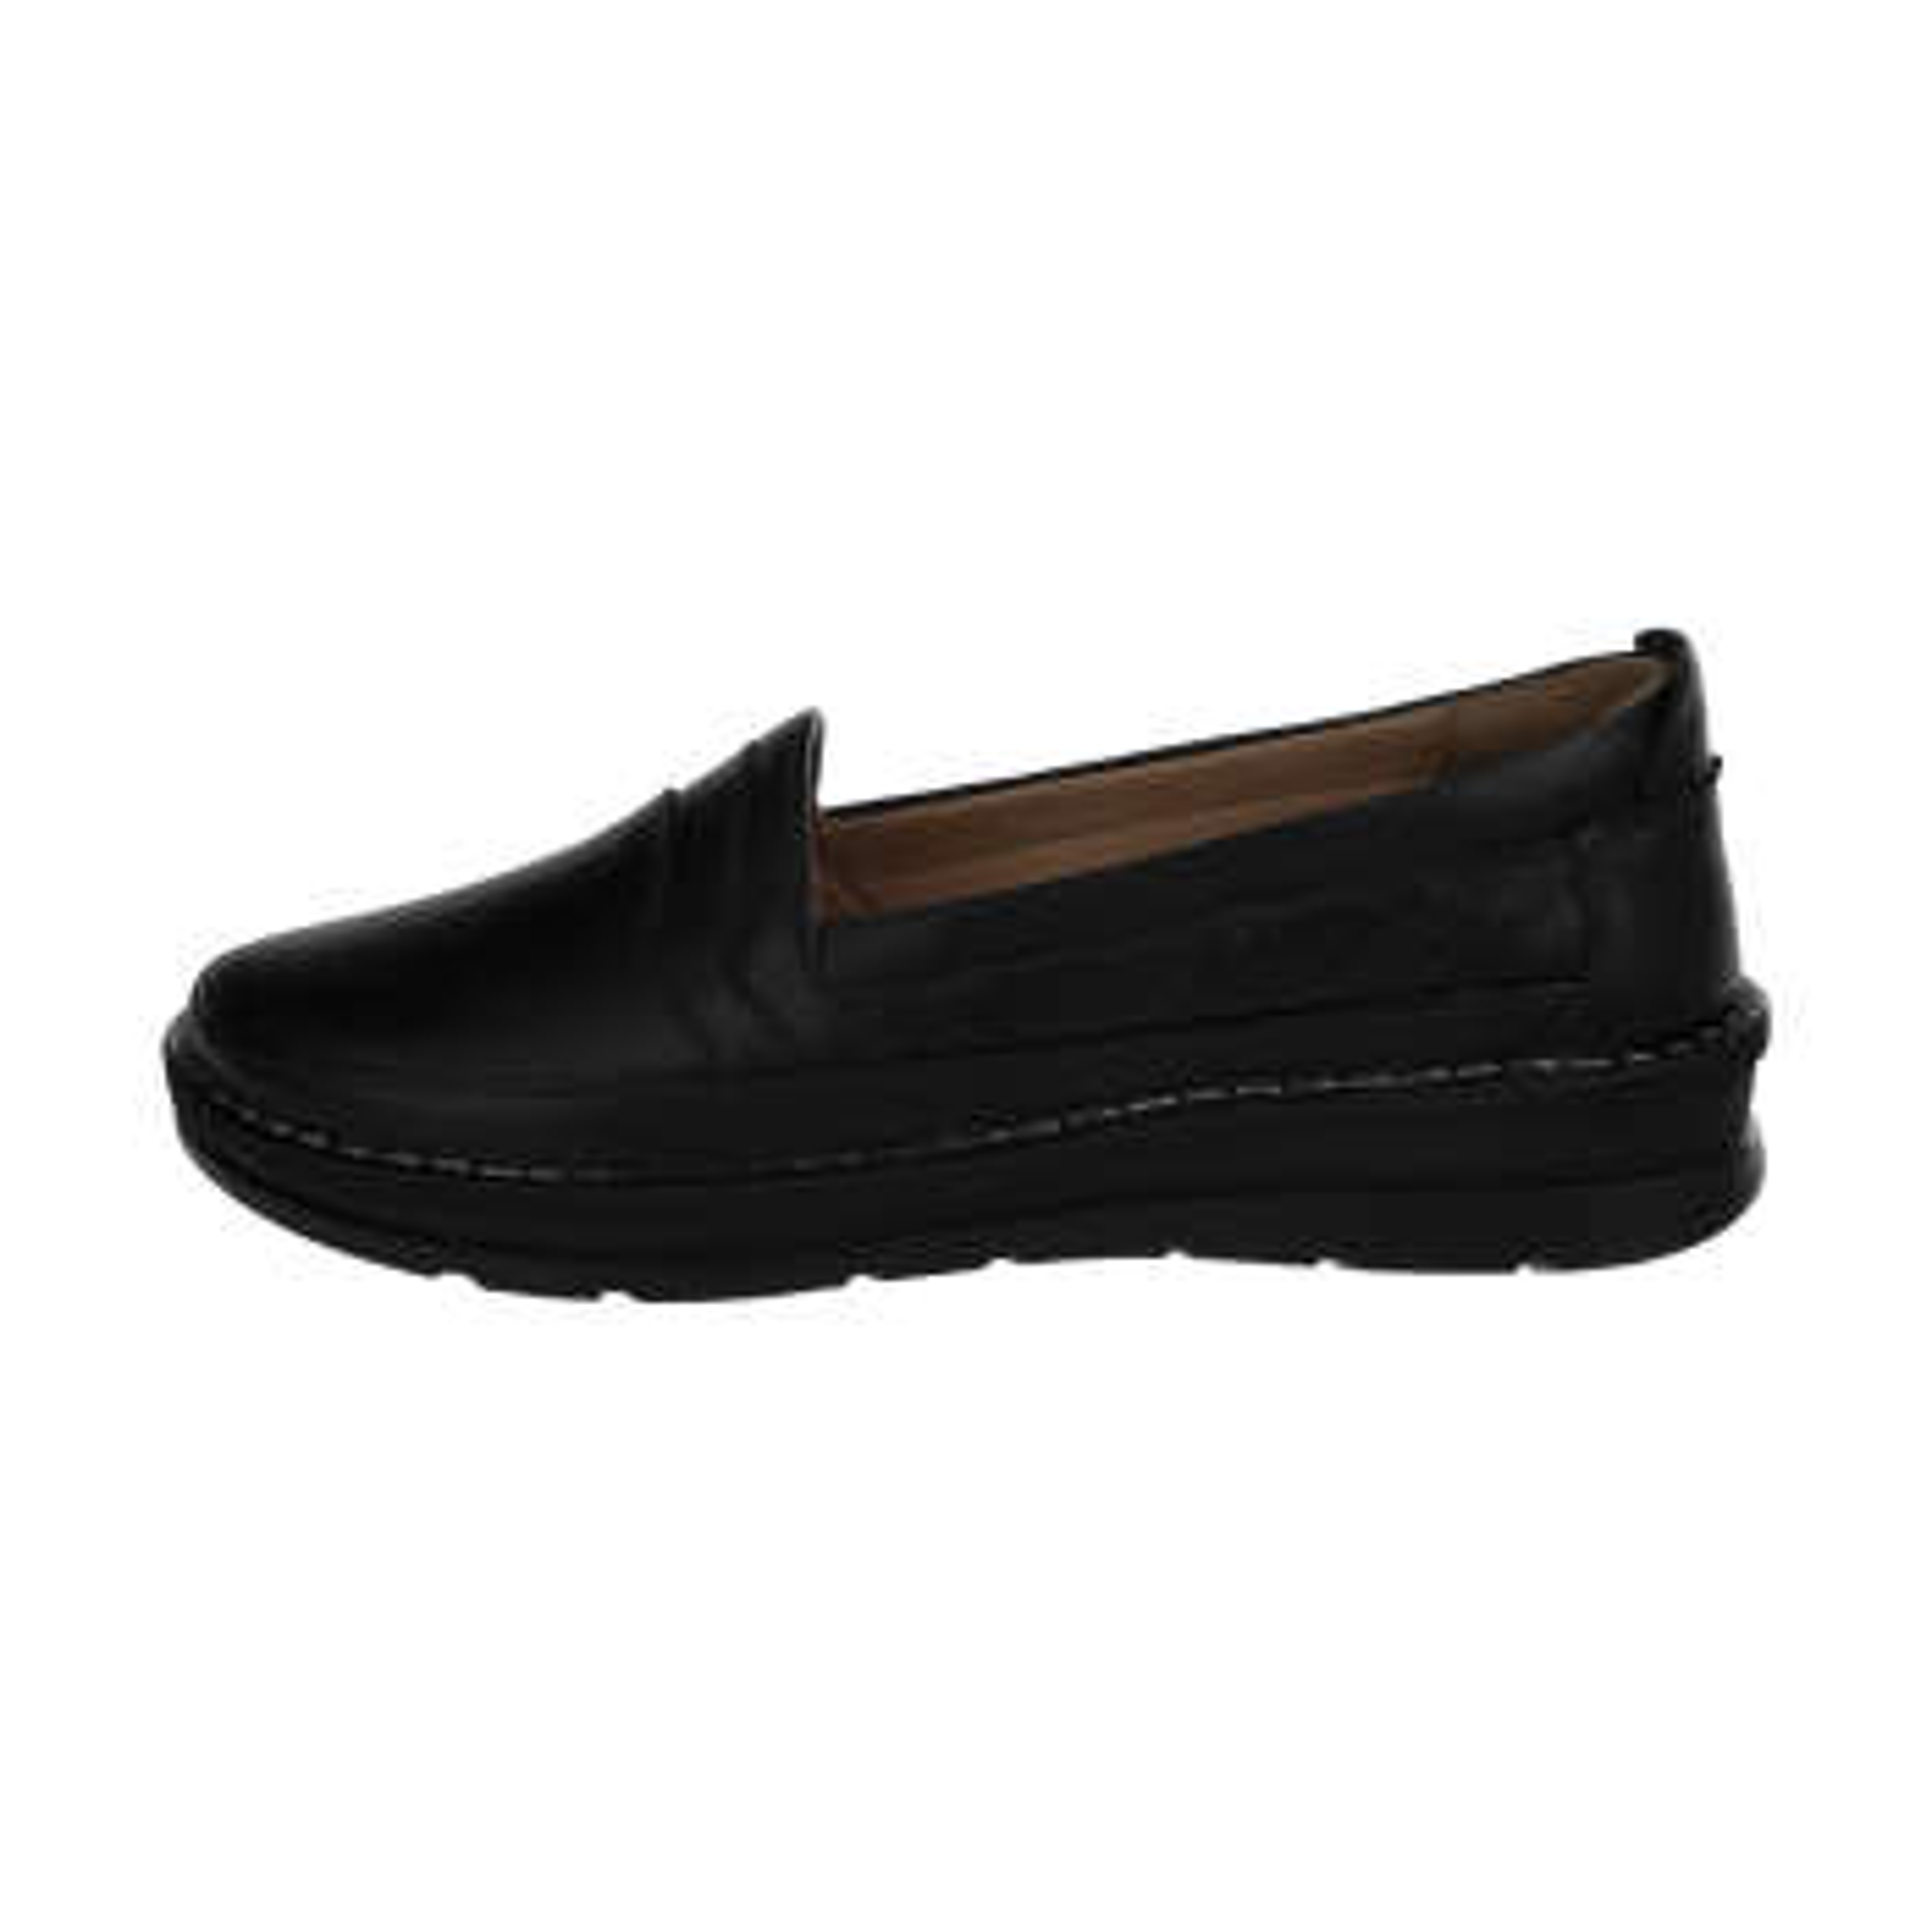 کفش روزمره زنانه مایان مدل 5301A500101